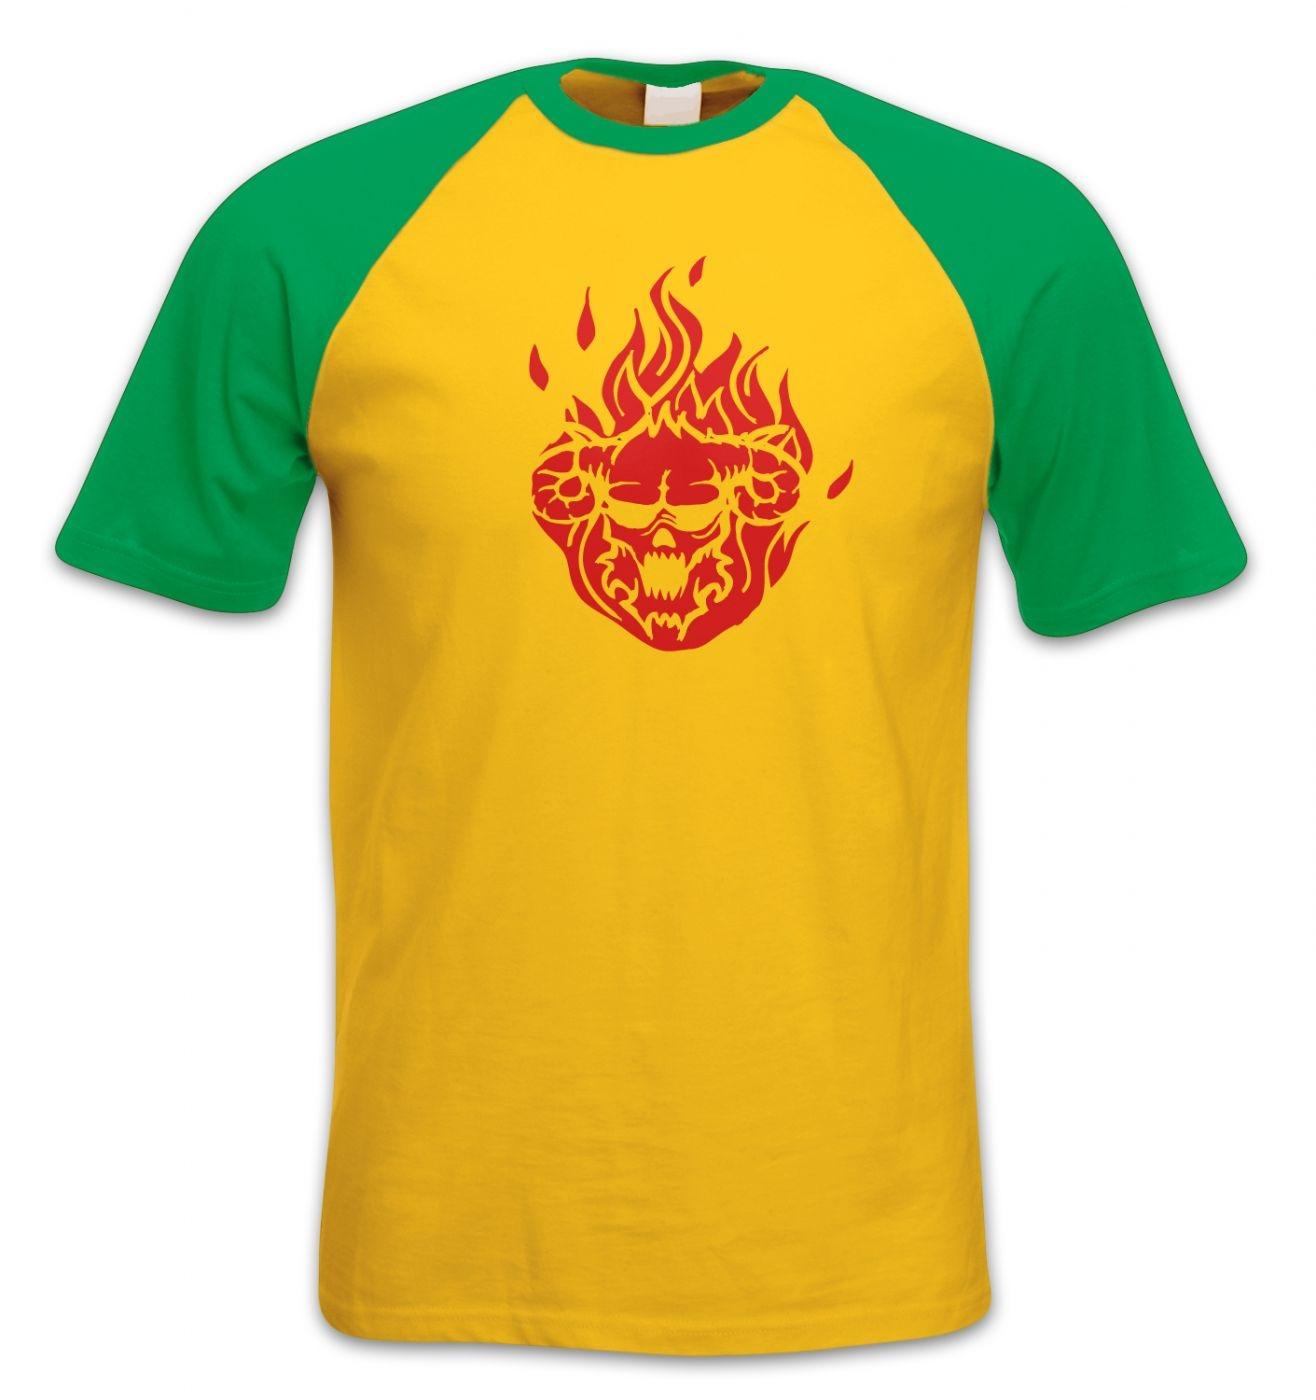 Flaming Demon's Head short-sleeved baseball t-shirt